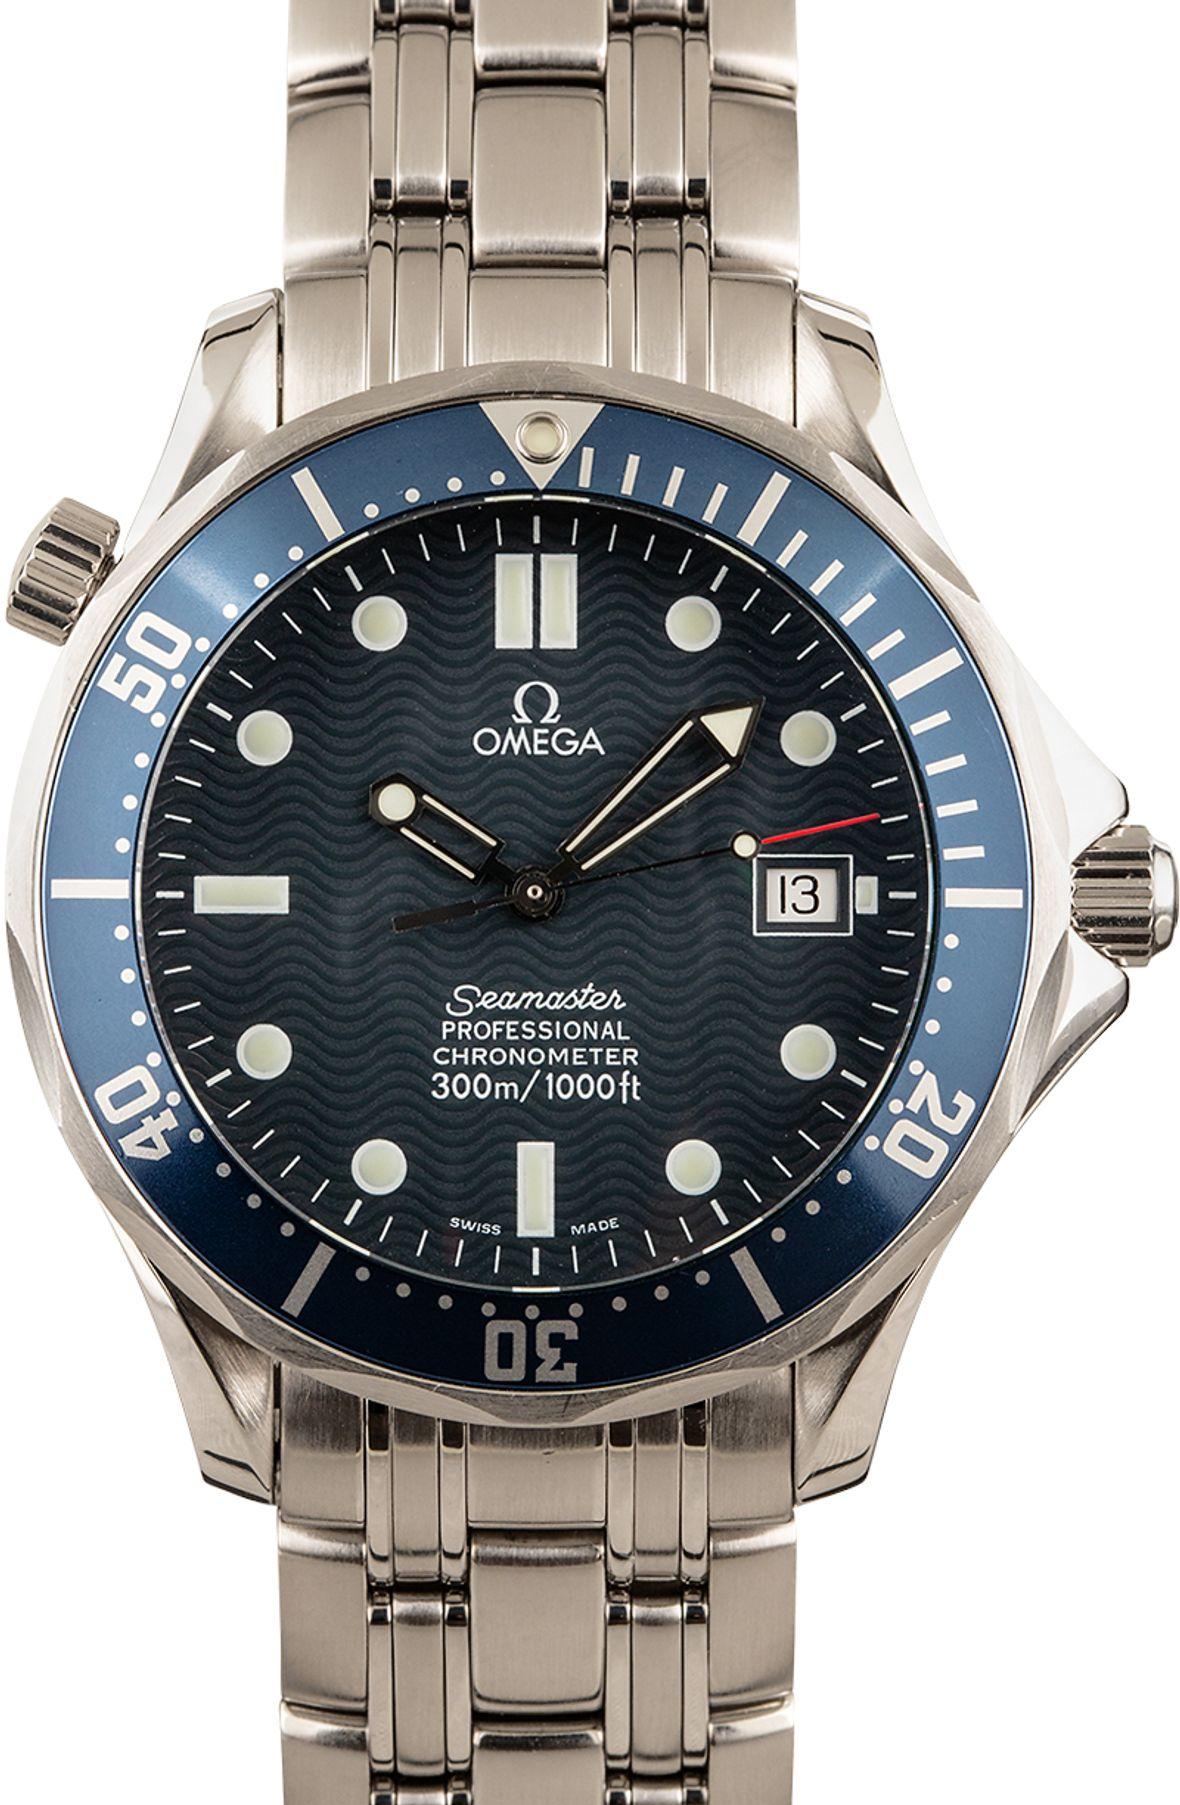 James Bond Omega Seamaster Professional 300M Chronometer 2531.80